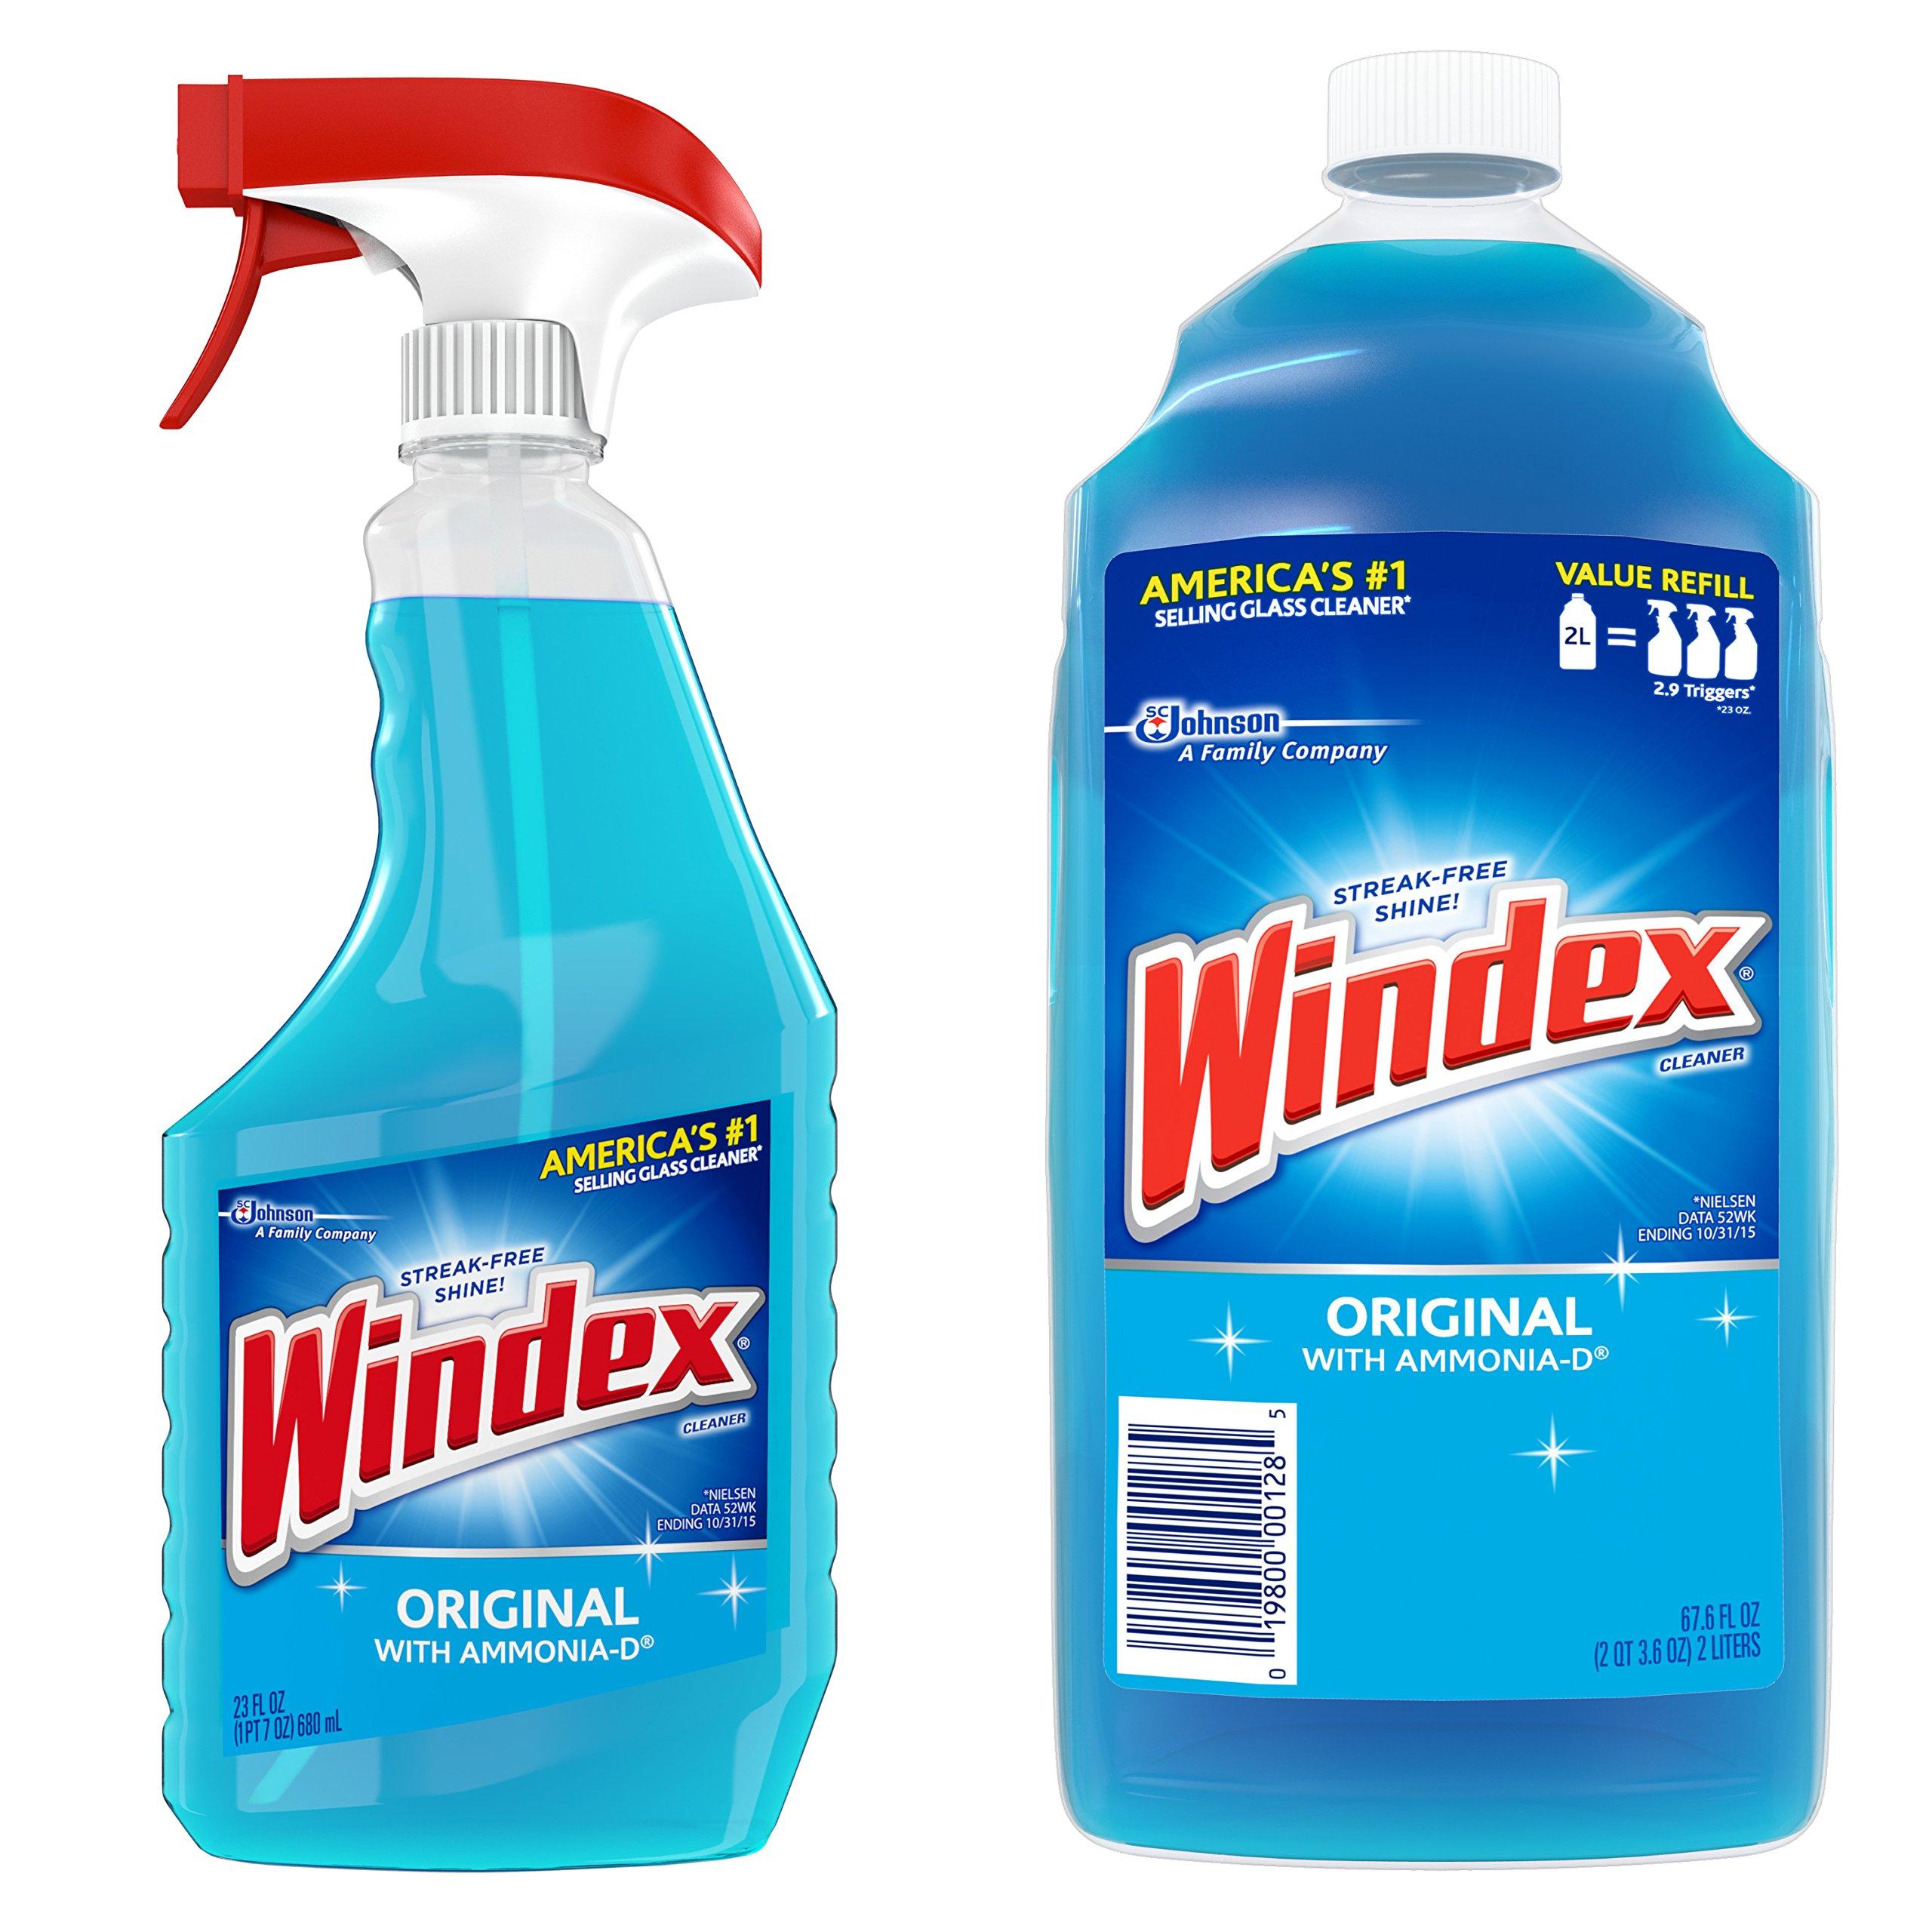 Windex Original Glass Cleaner Pack, Refill 67.6 fl oz + Trigger 23 fl oz